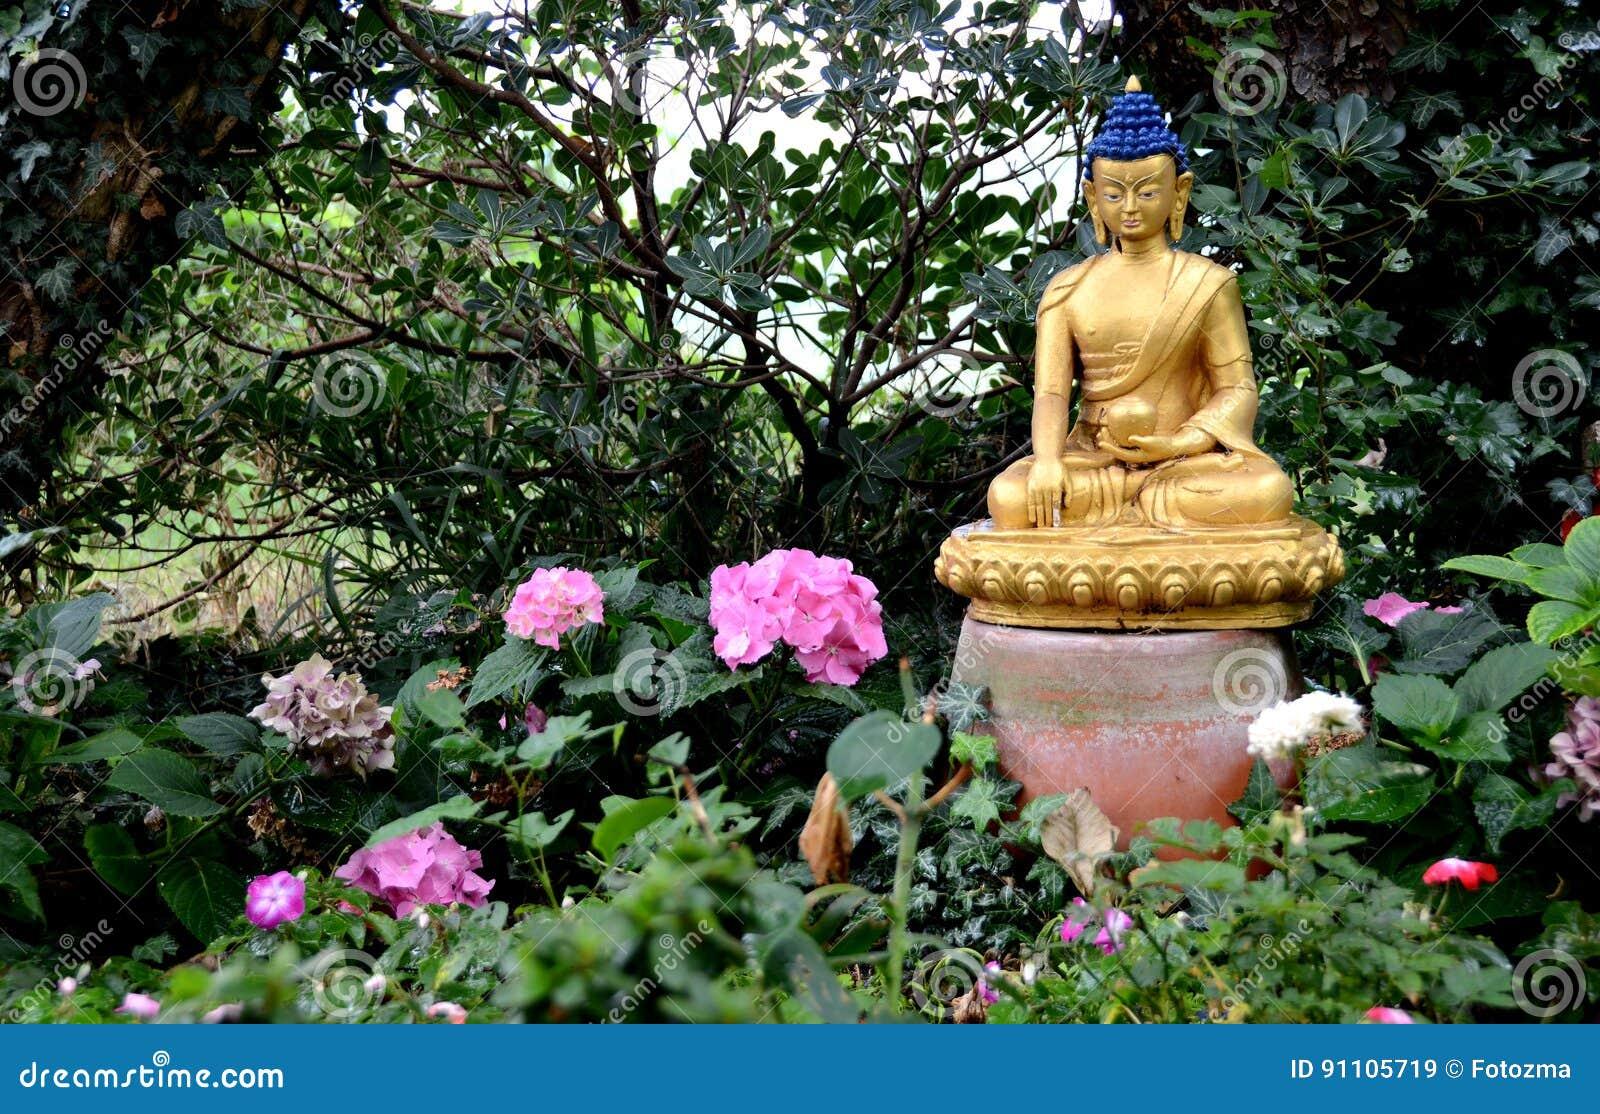 Goldener Buddha Im Garten Stockbild Bild Von Dunkel 91105719